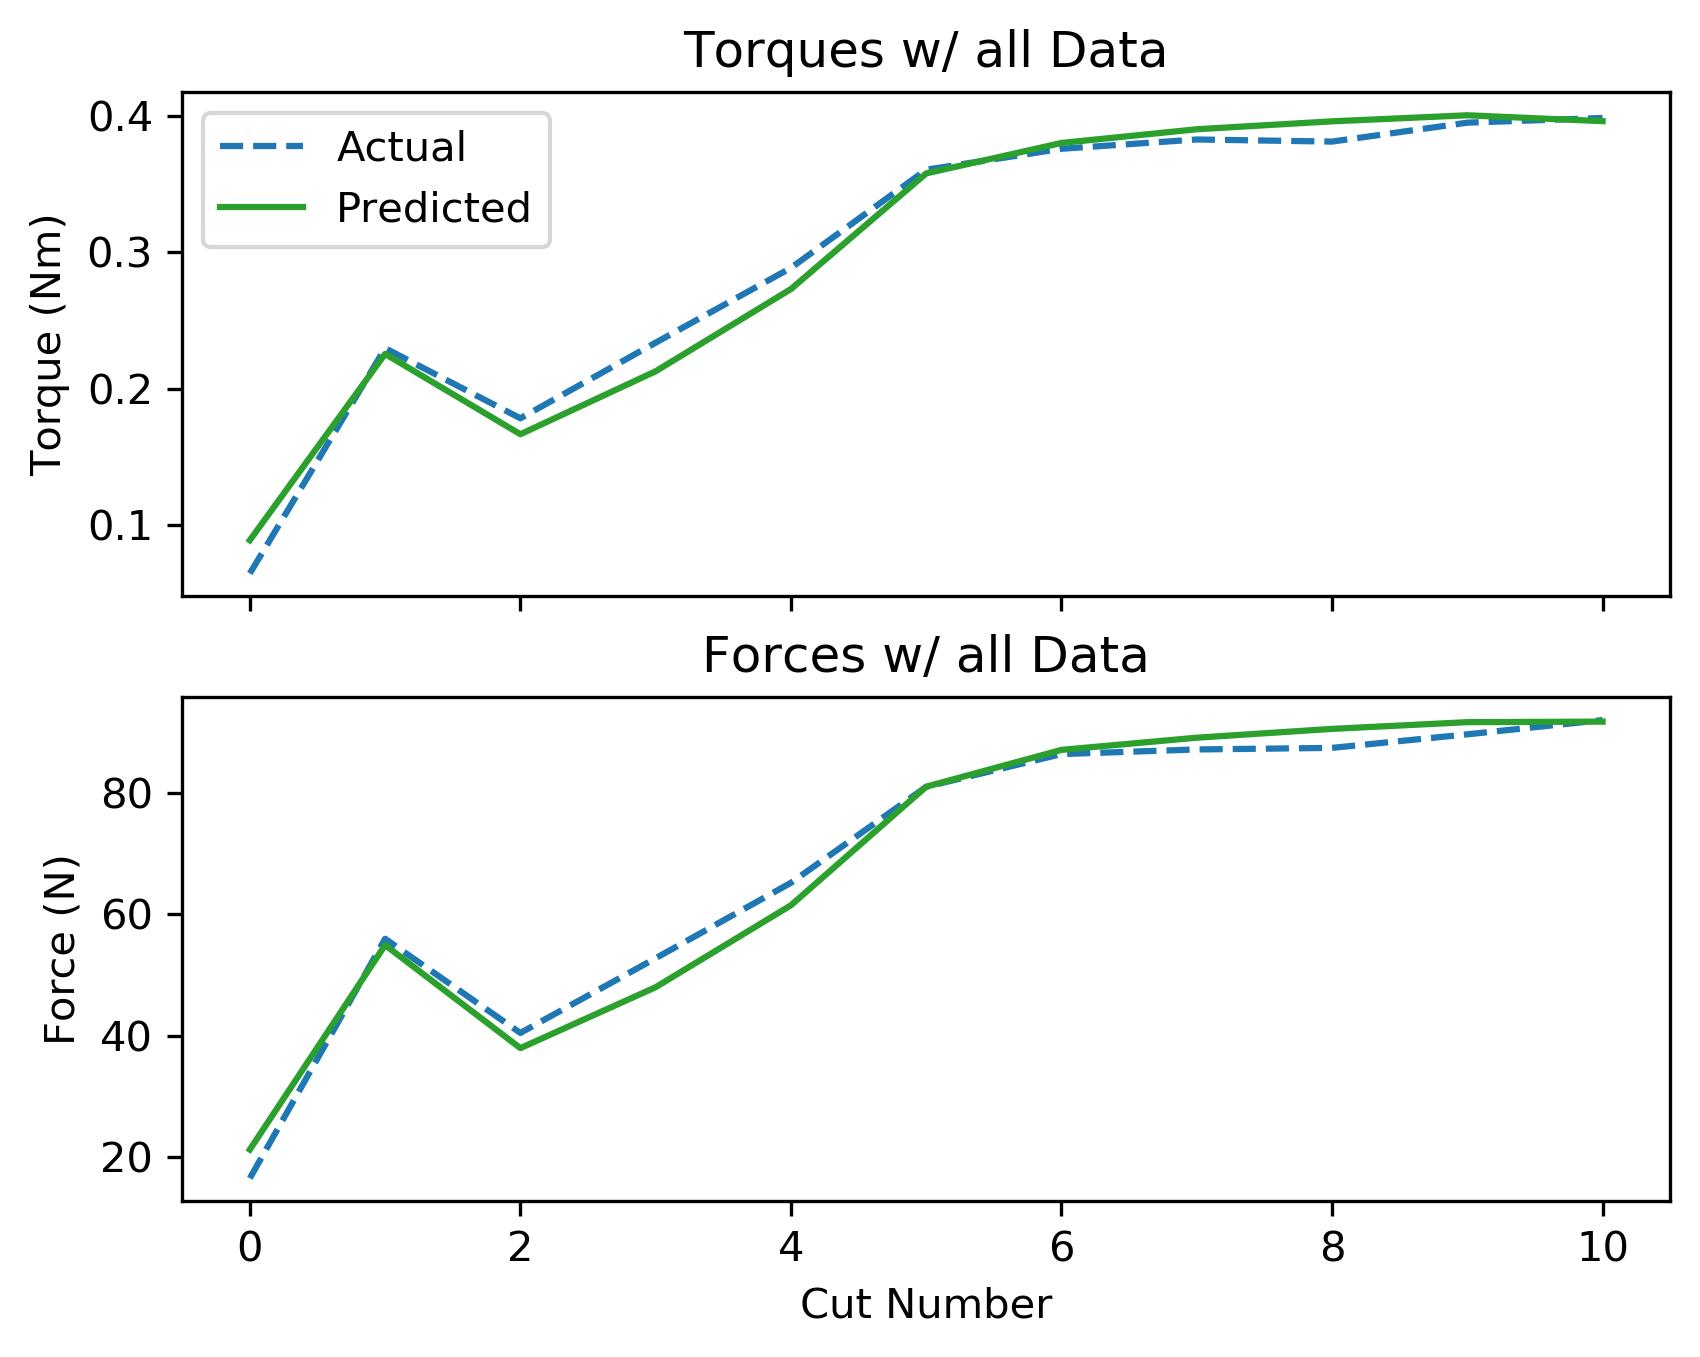 assets/ammp_graphs/ammp-lcs-3_8_all_data.png